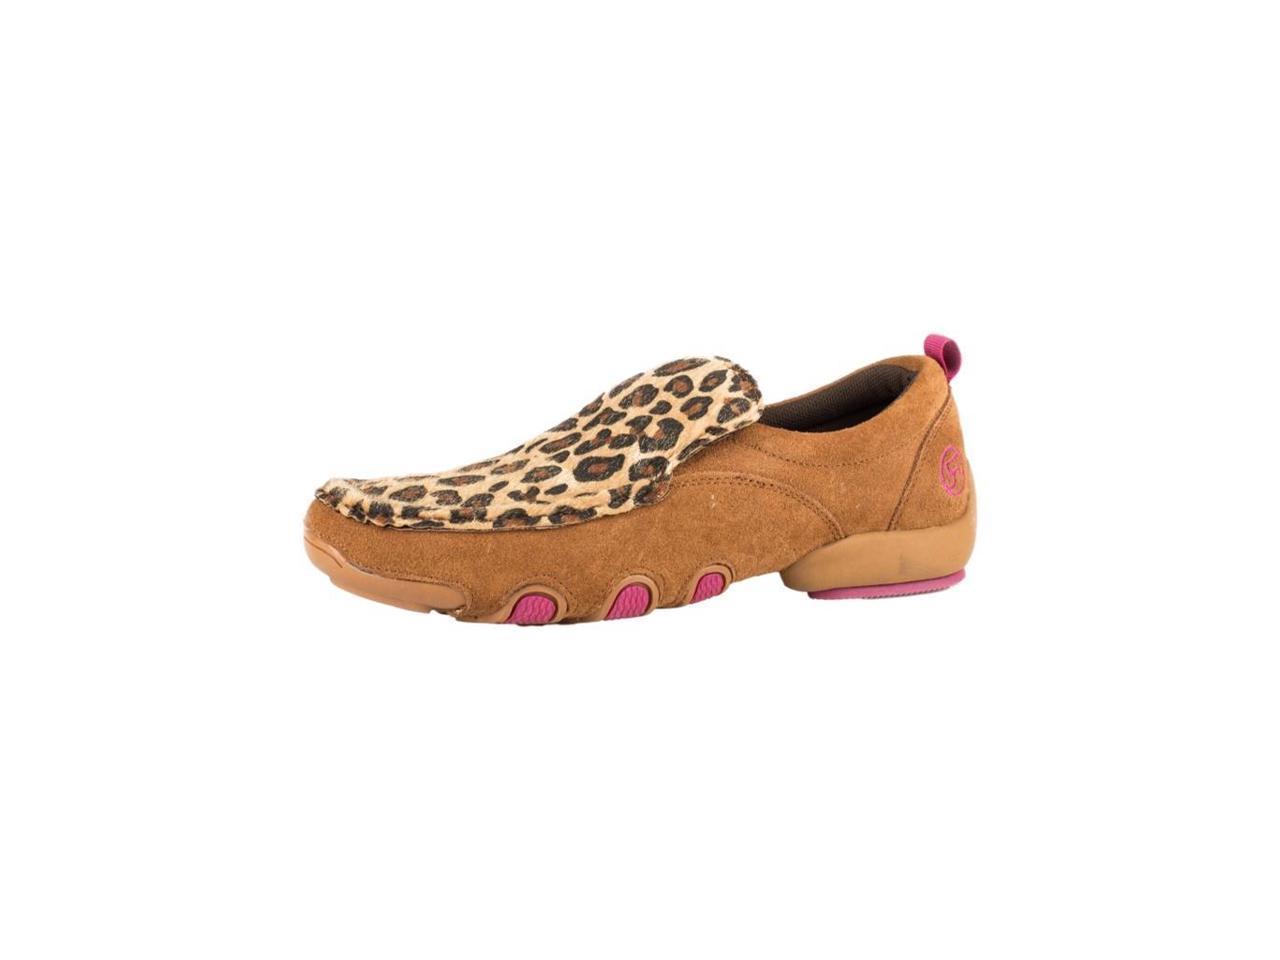 Roper Western Shoes Shoes Shoes Womens Cheetah Moc 8 B Tan 09-021-1778-0128 TA 5703b8